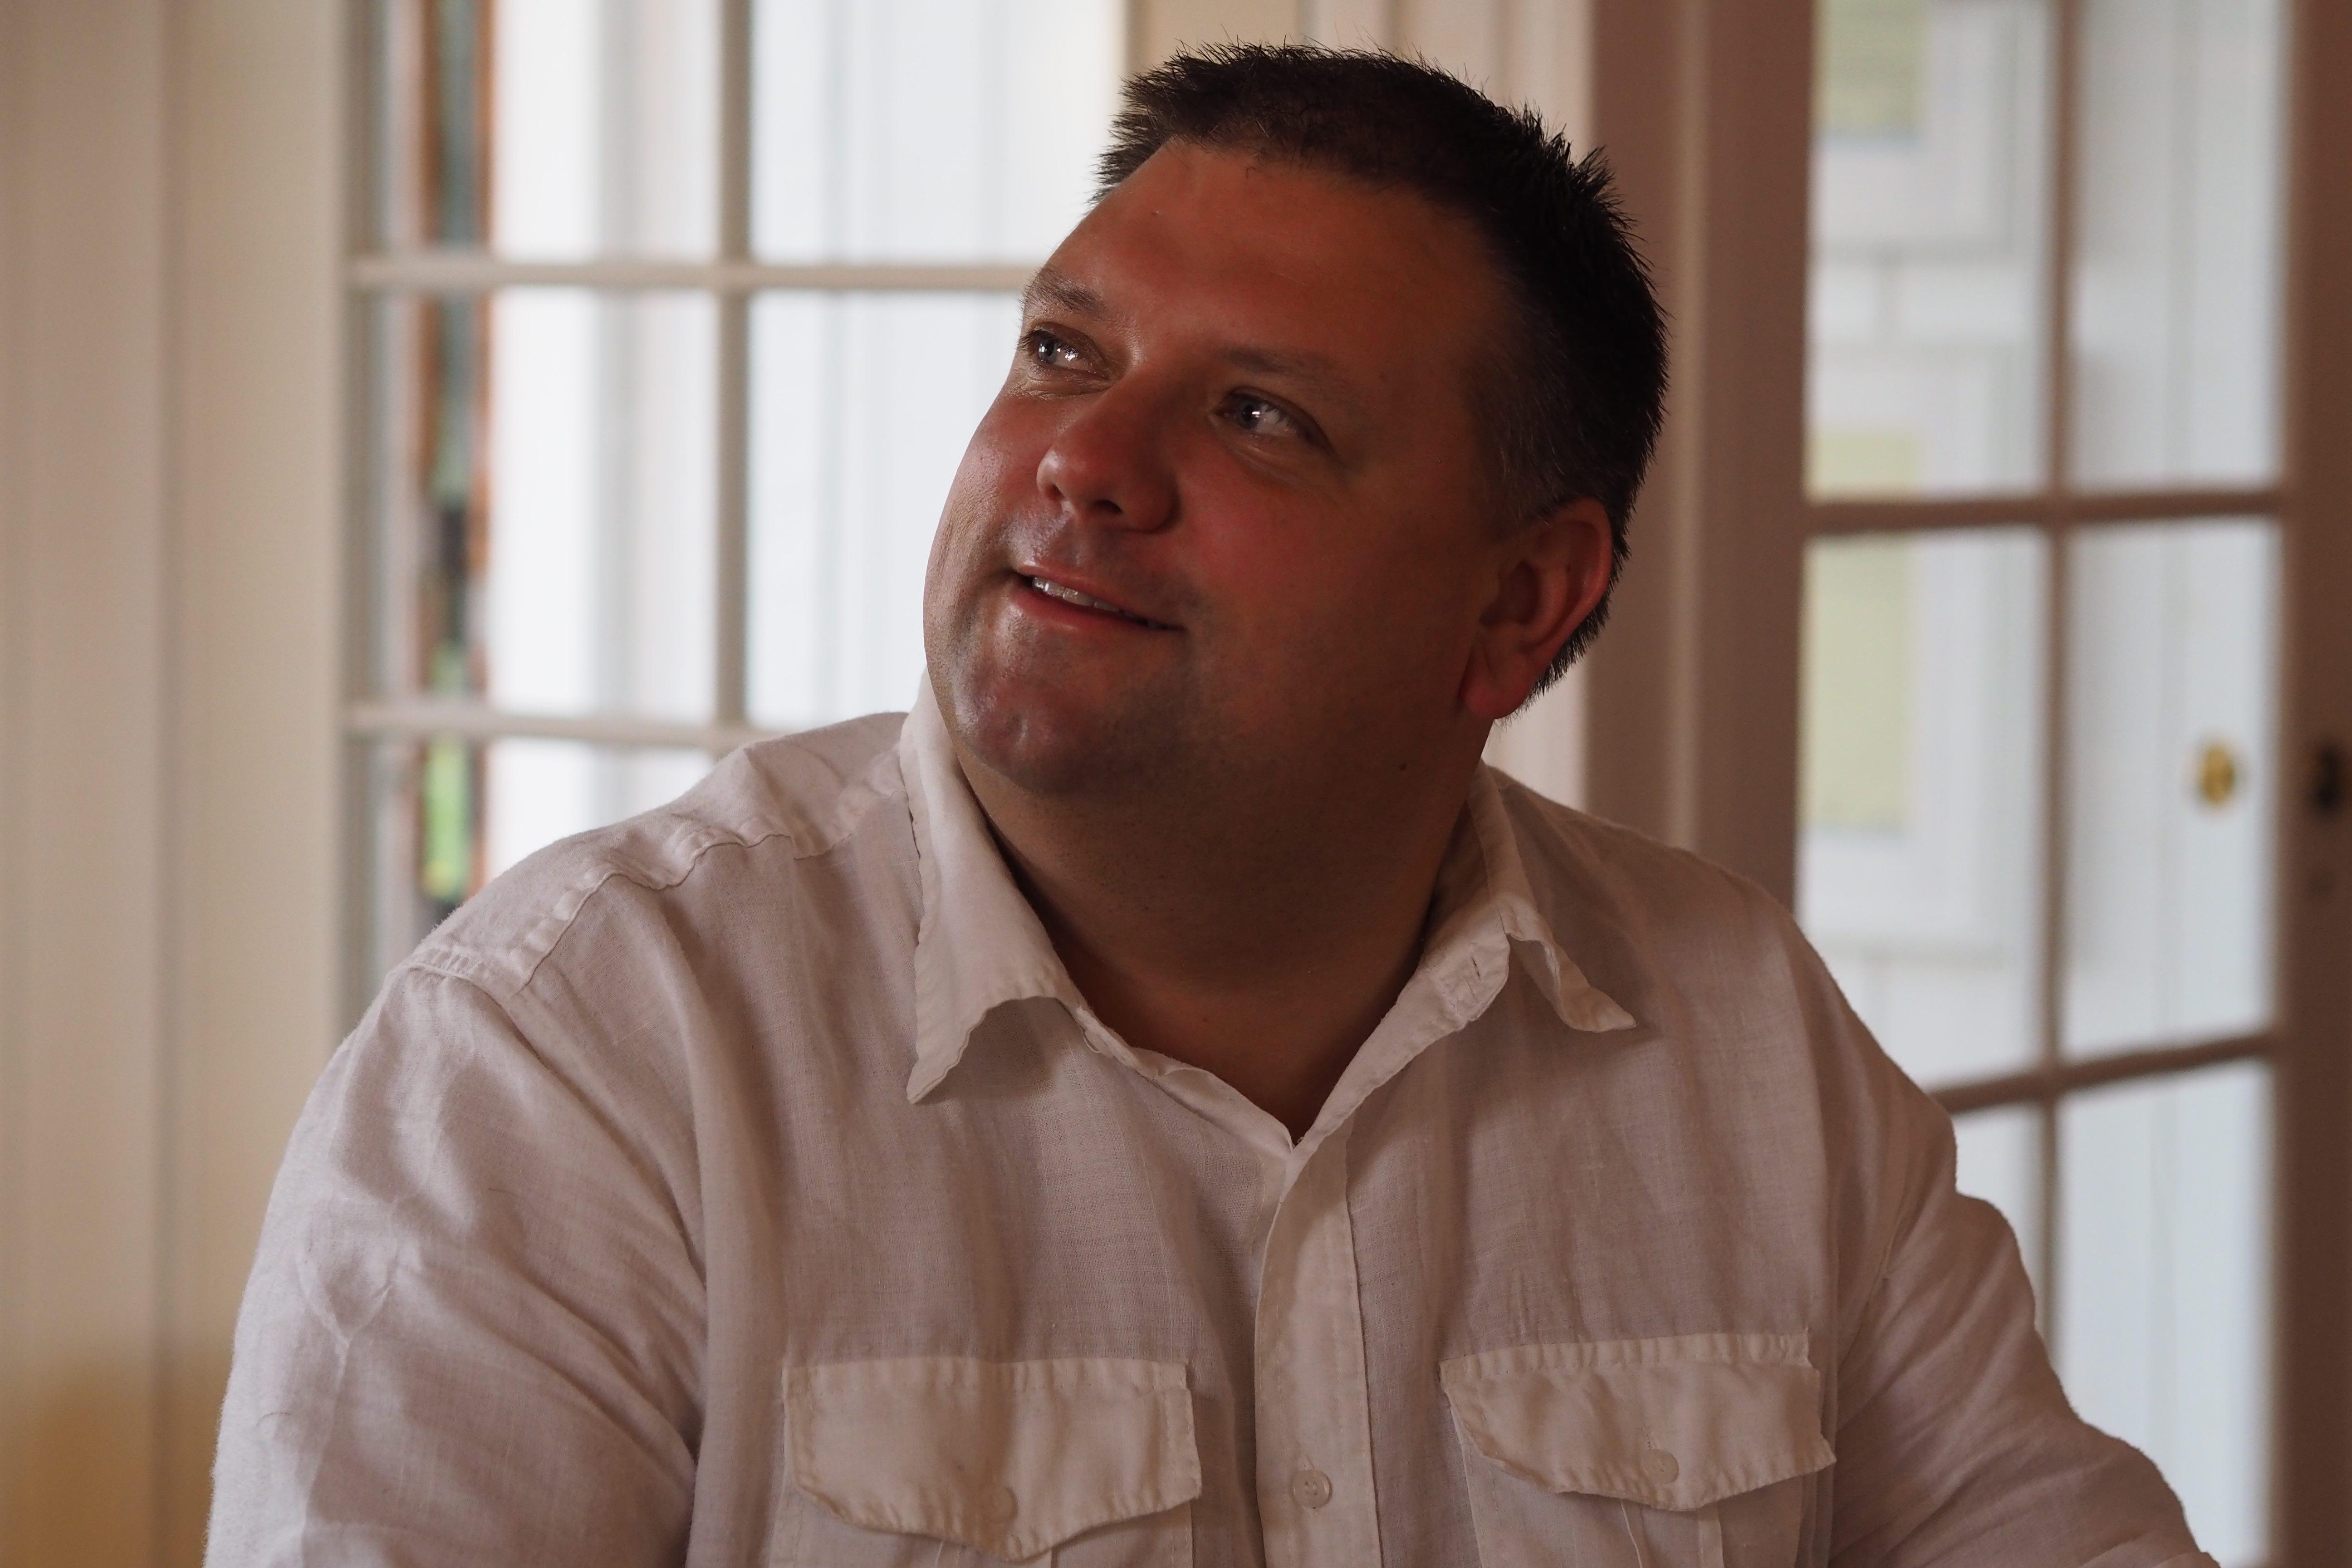 Anders Gerner Frost er valgt som nytgribskovs klare bud Gribskovs nye borgmester